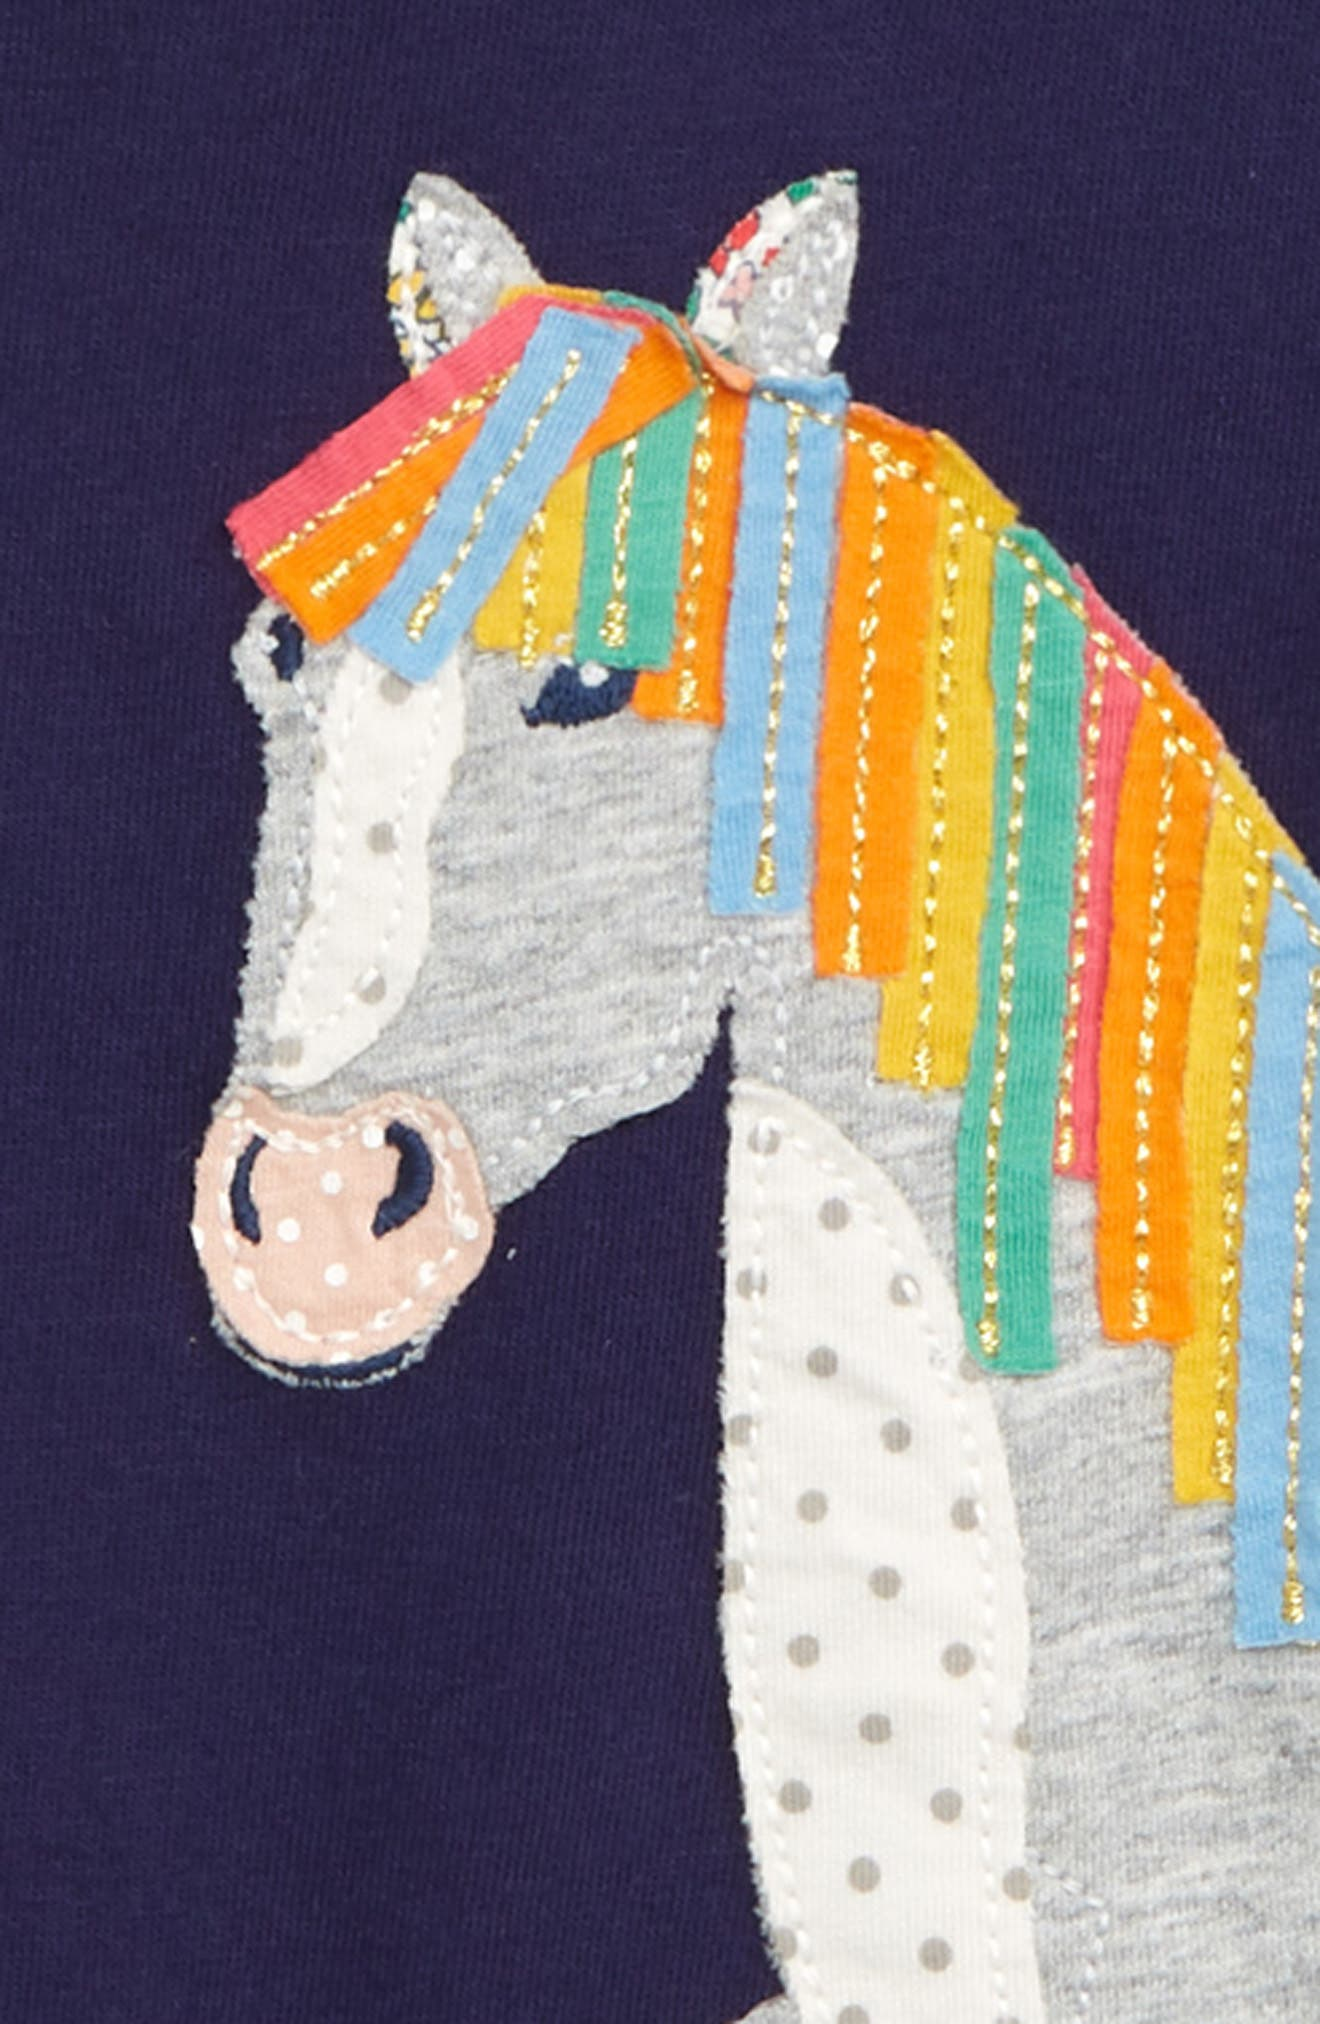 Animal Appliqué Tee,                             Alternate thumbnail 2, color,                             PRUSSIAN BLUE HORSE